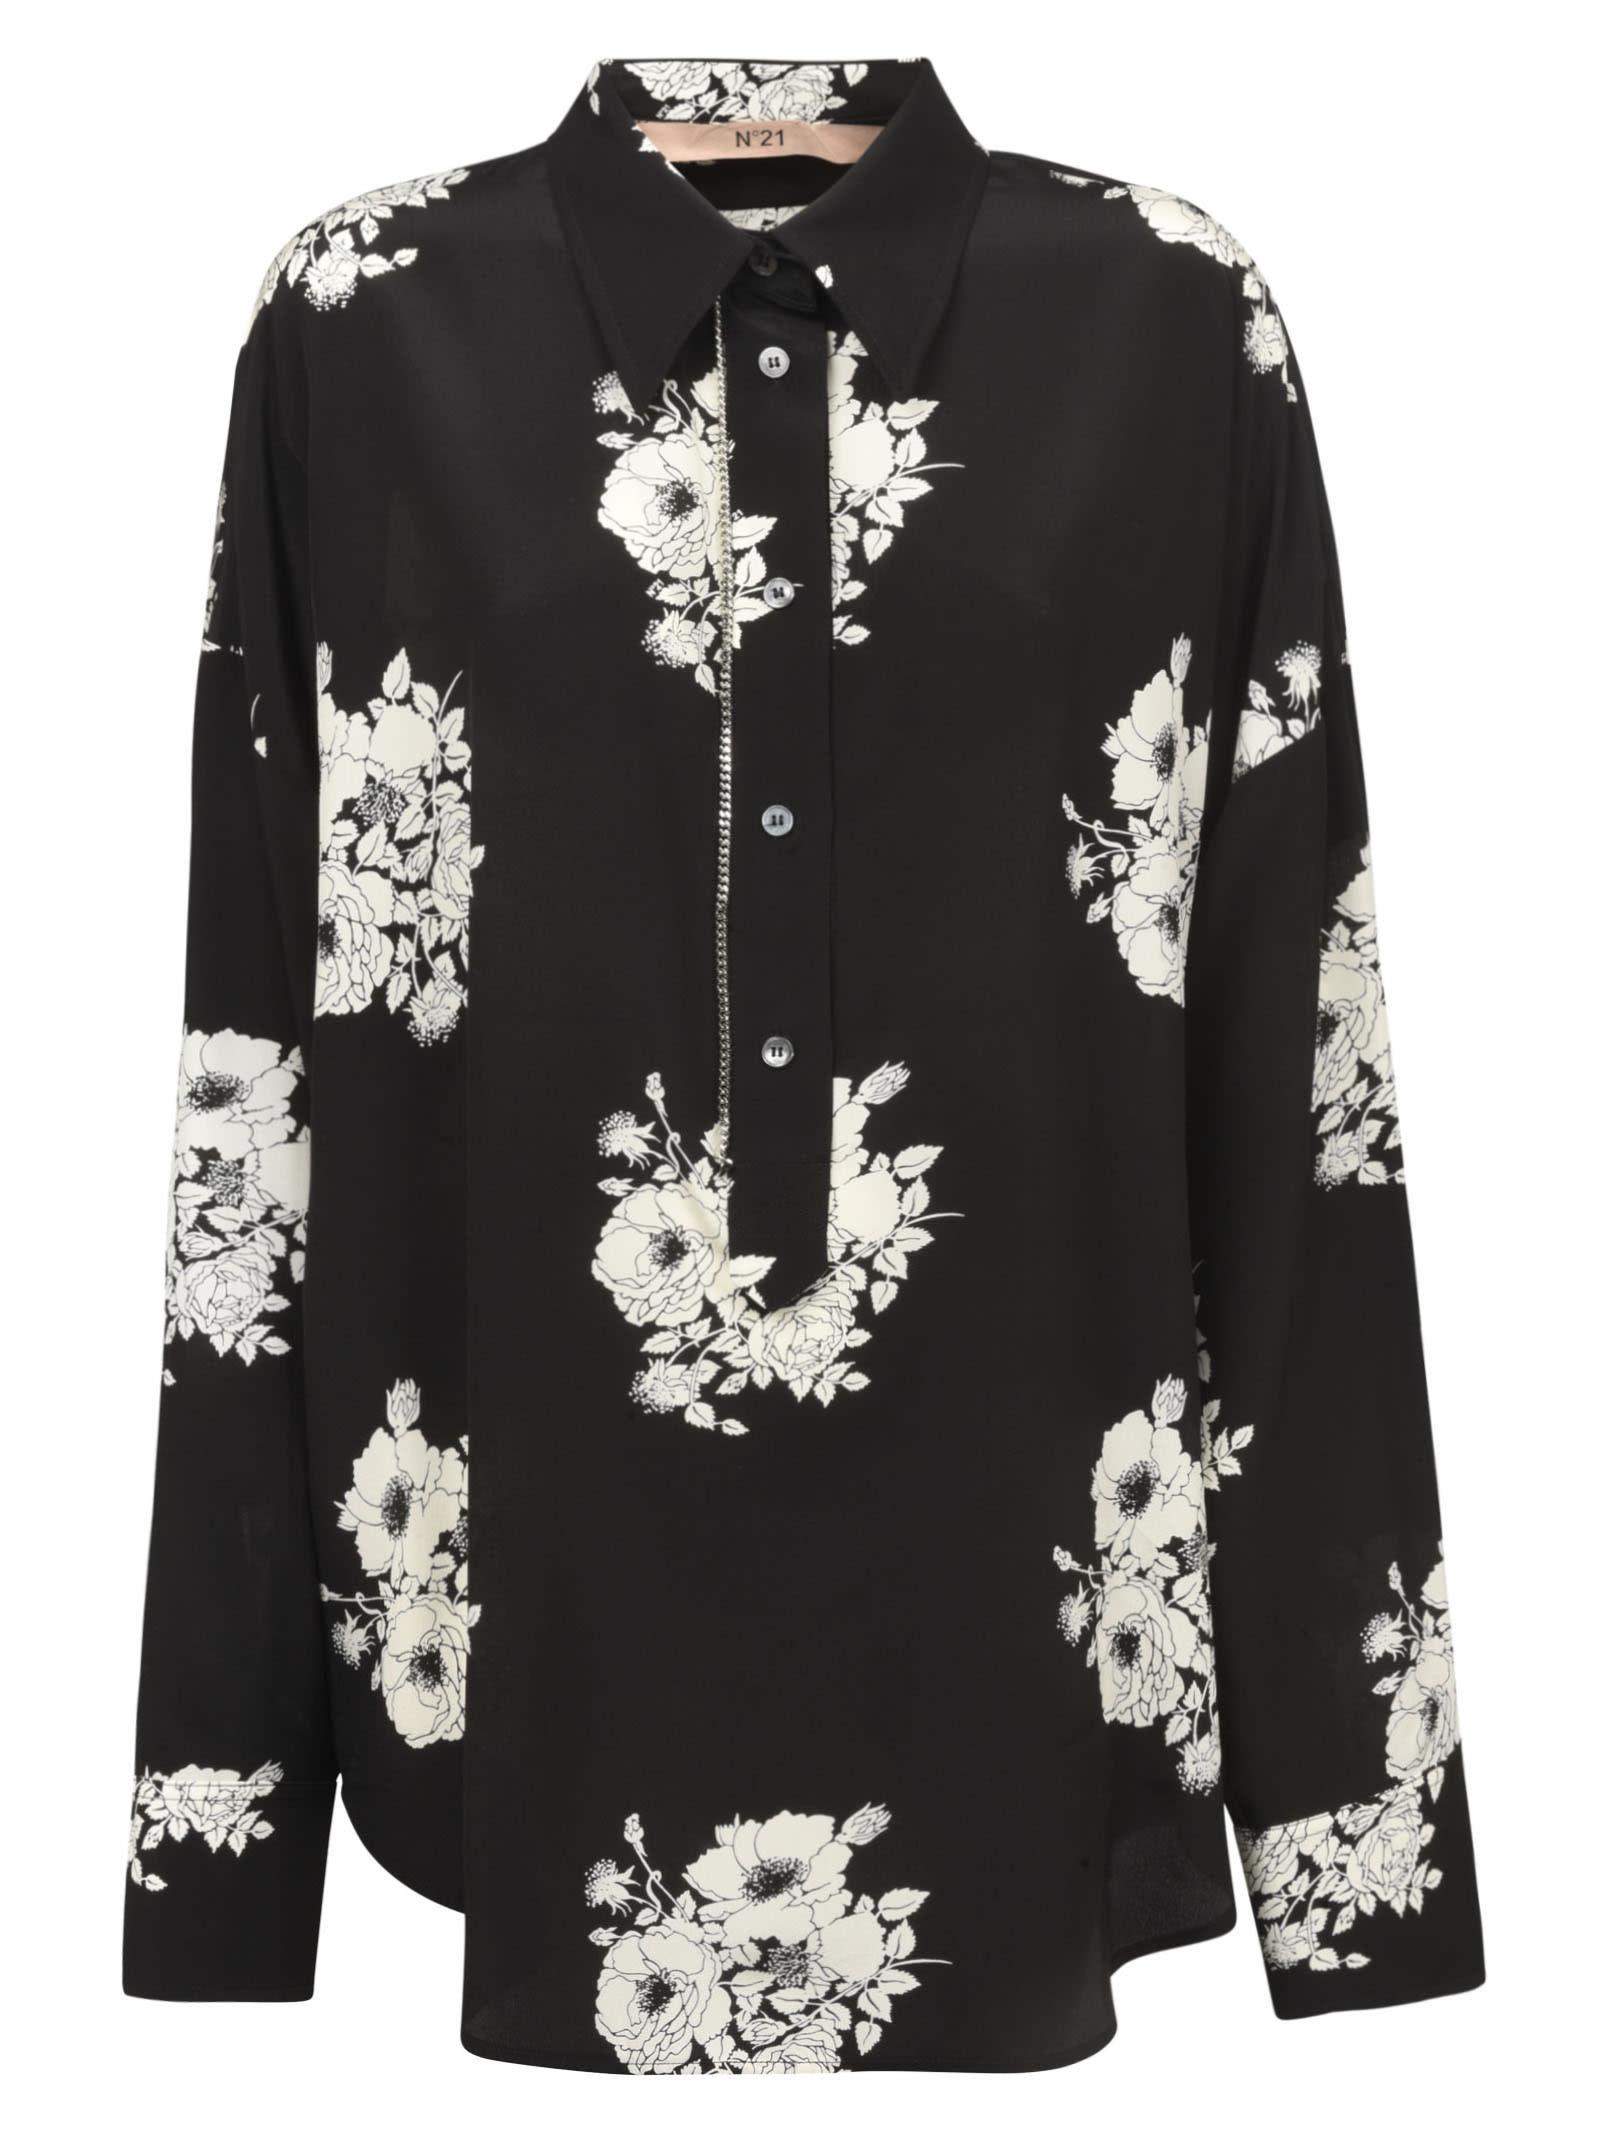 N.21 Long-sleeve Floral Print Shirt